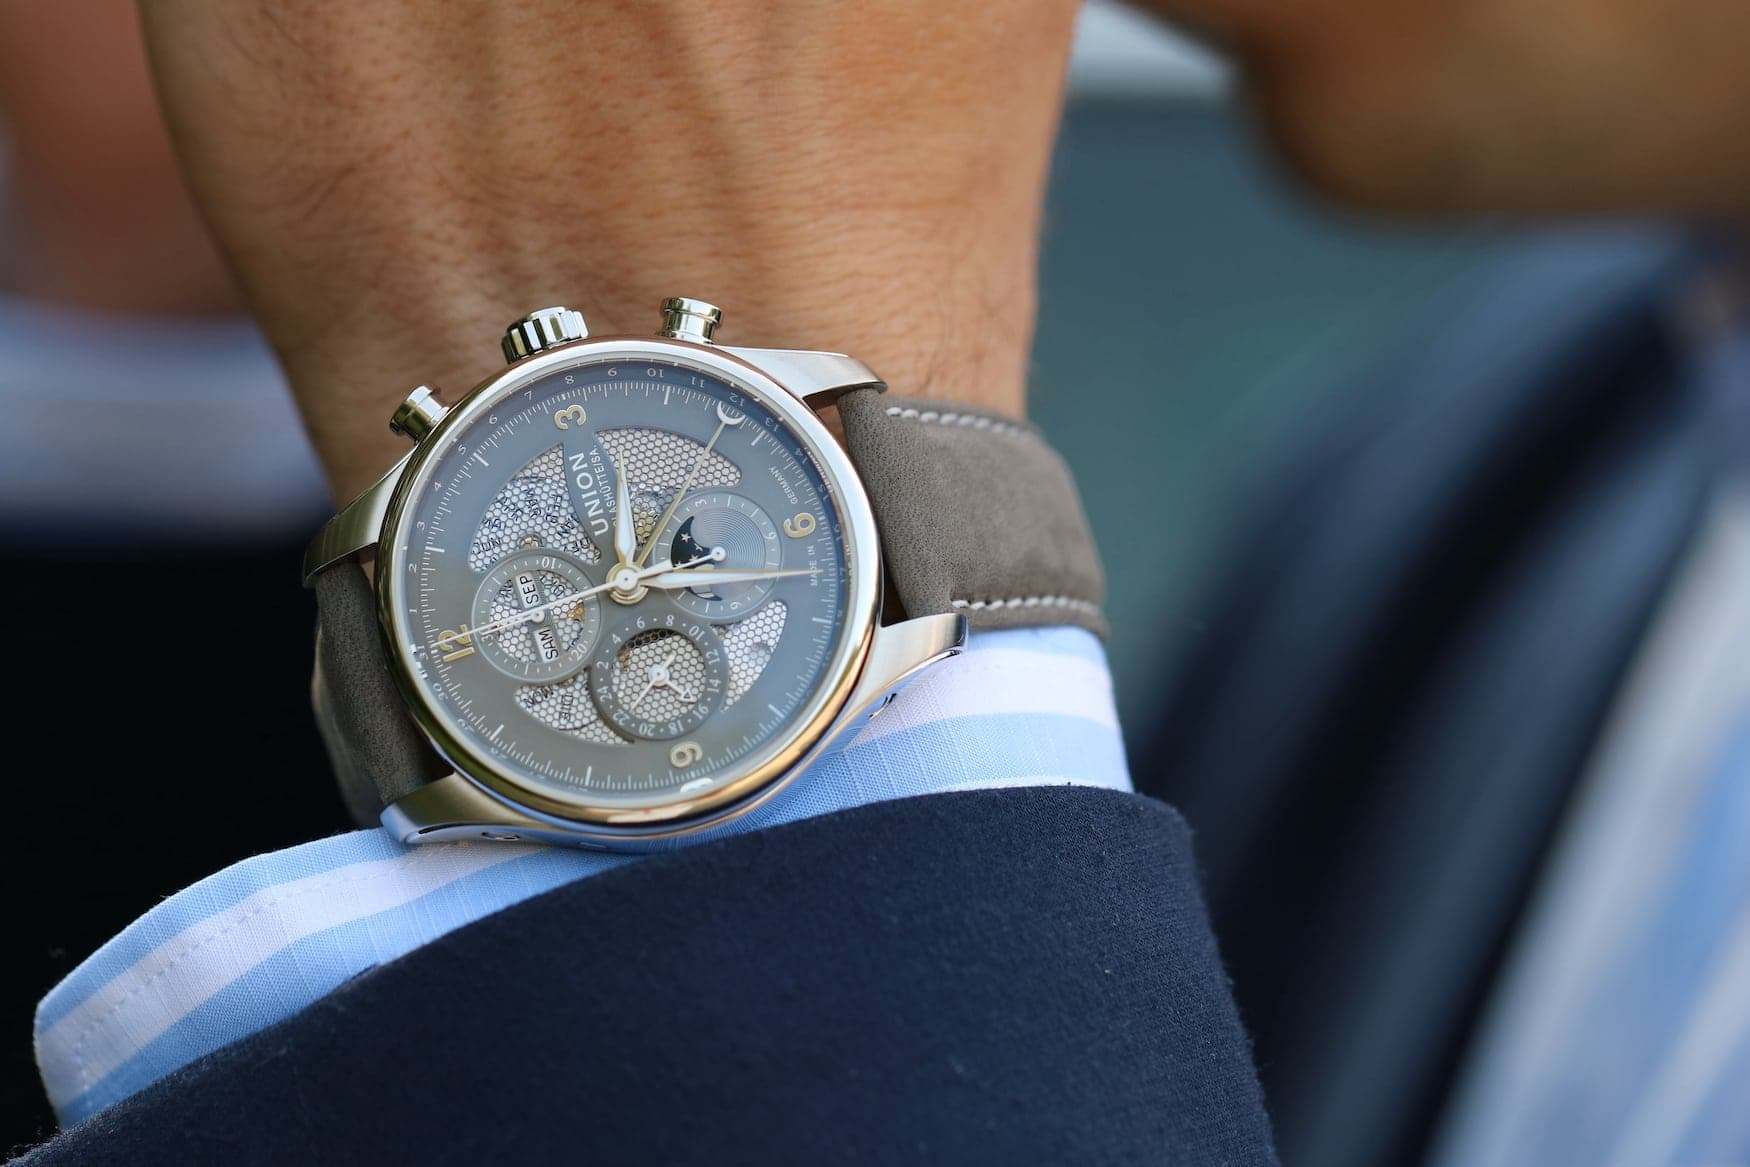 Mann trägt das Uhrenmodell Belisar Chronograph Mondphase am Armgelenk